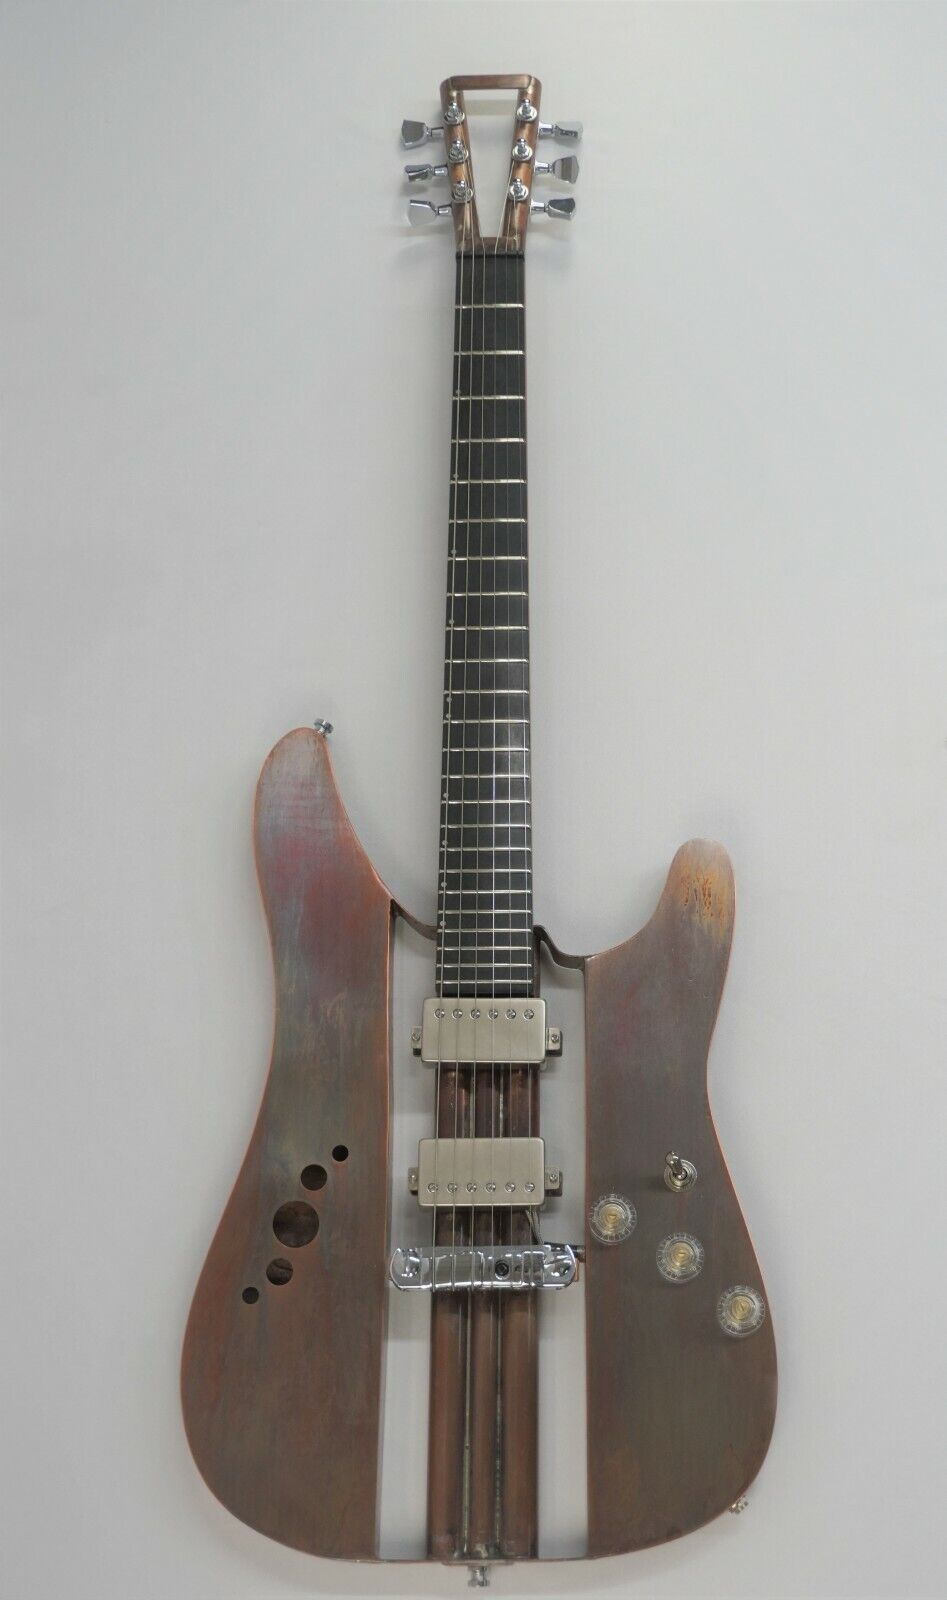 Toneacane USA Copper Custom Electric Guitar Limited Series 011 Of 100 - $475.00